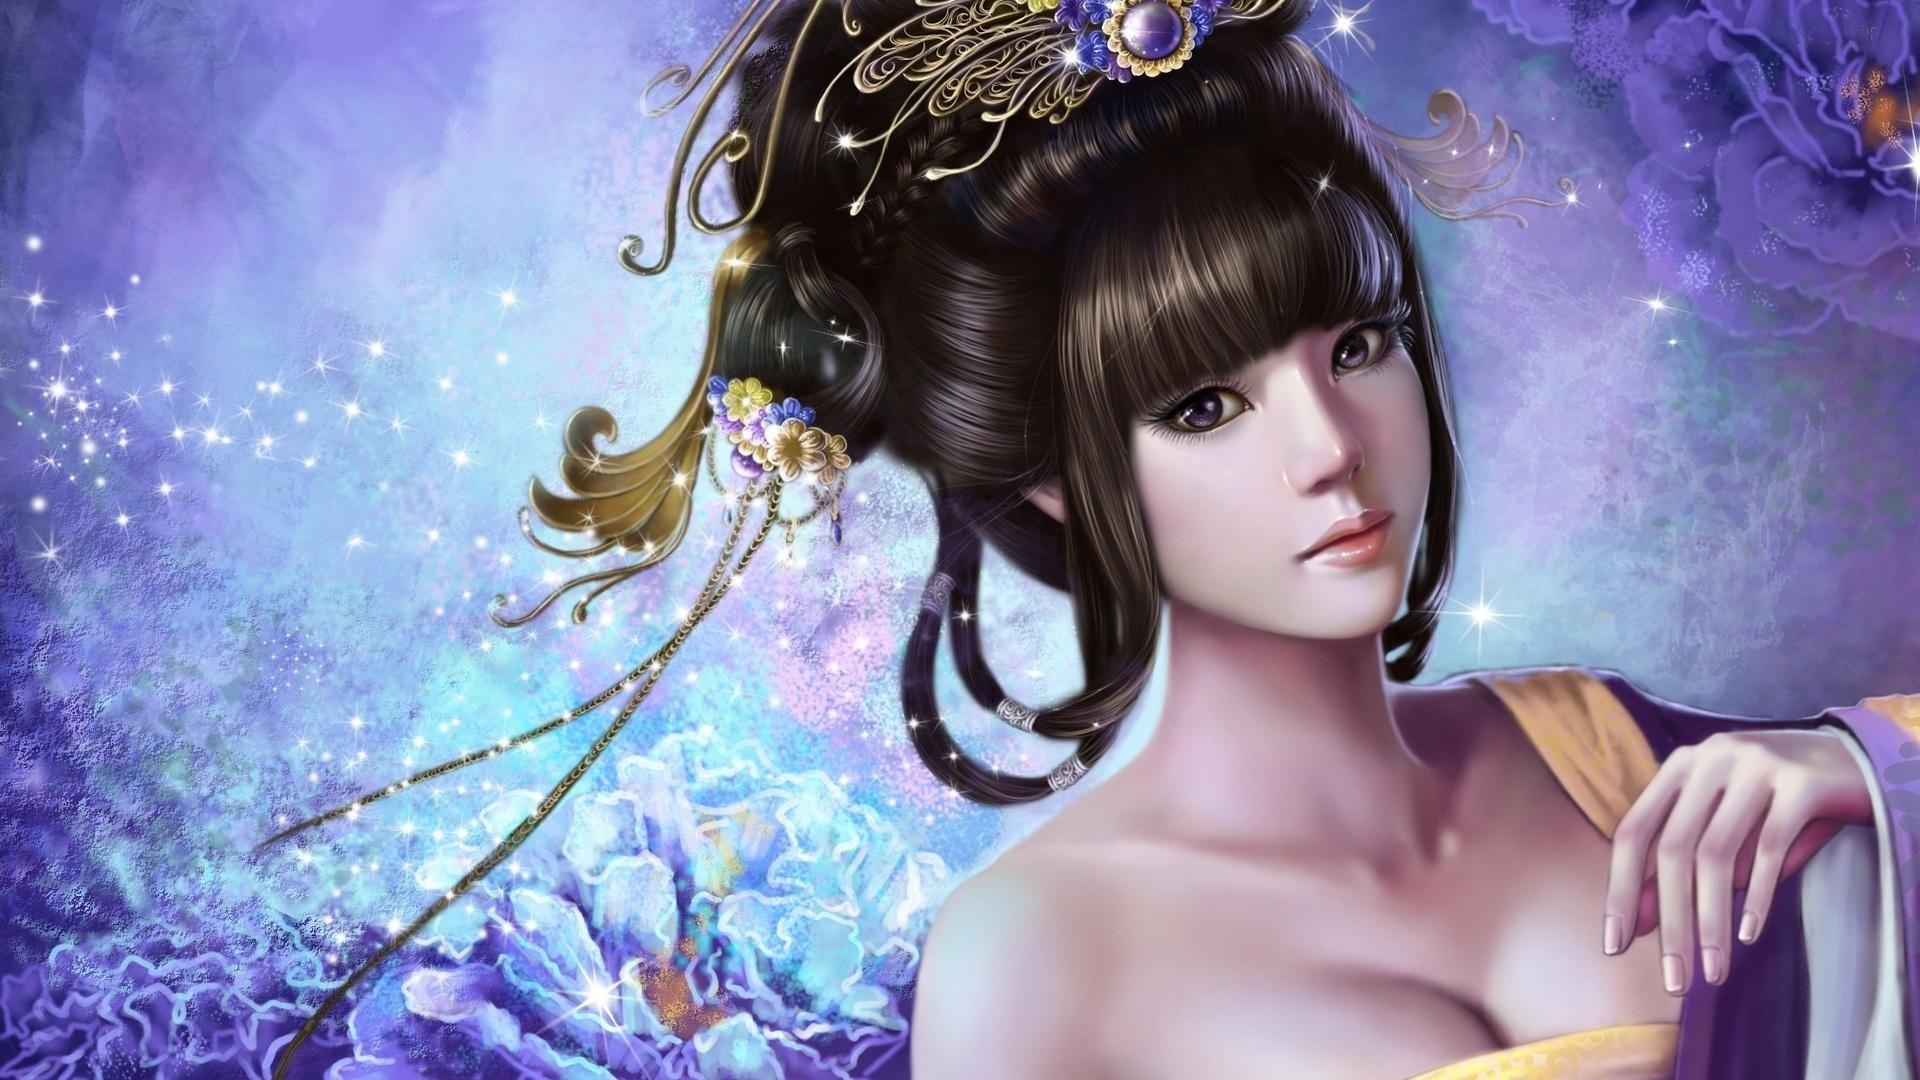 Fantasy Girl – Fantasy Wallpaper ID 990594 – Desktop Nexus Abstract